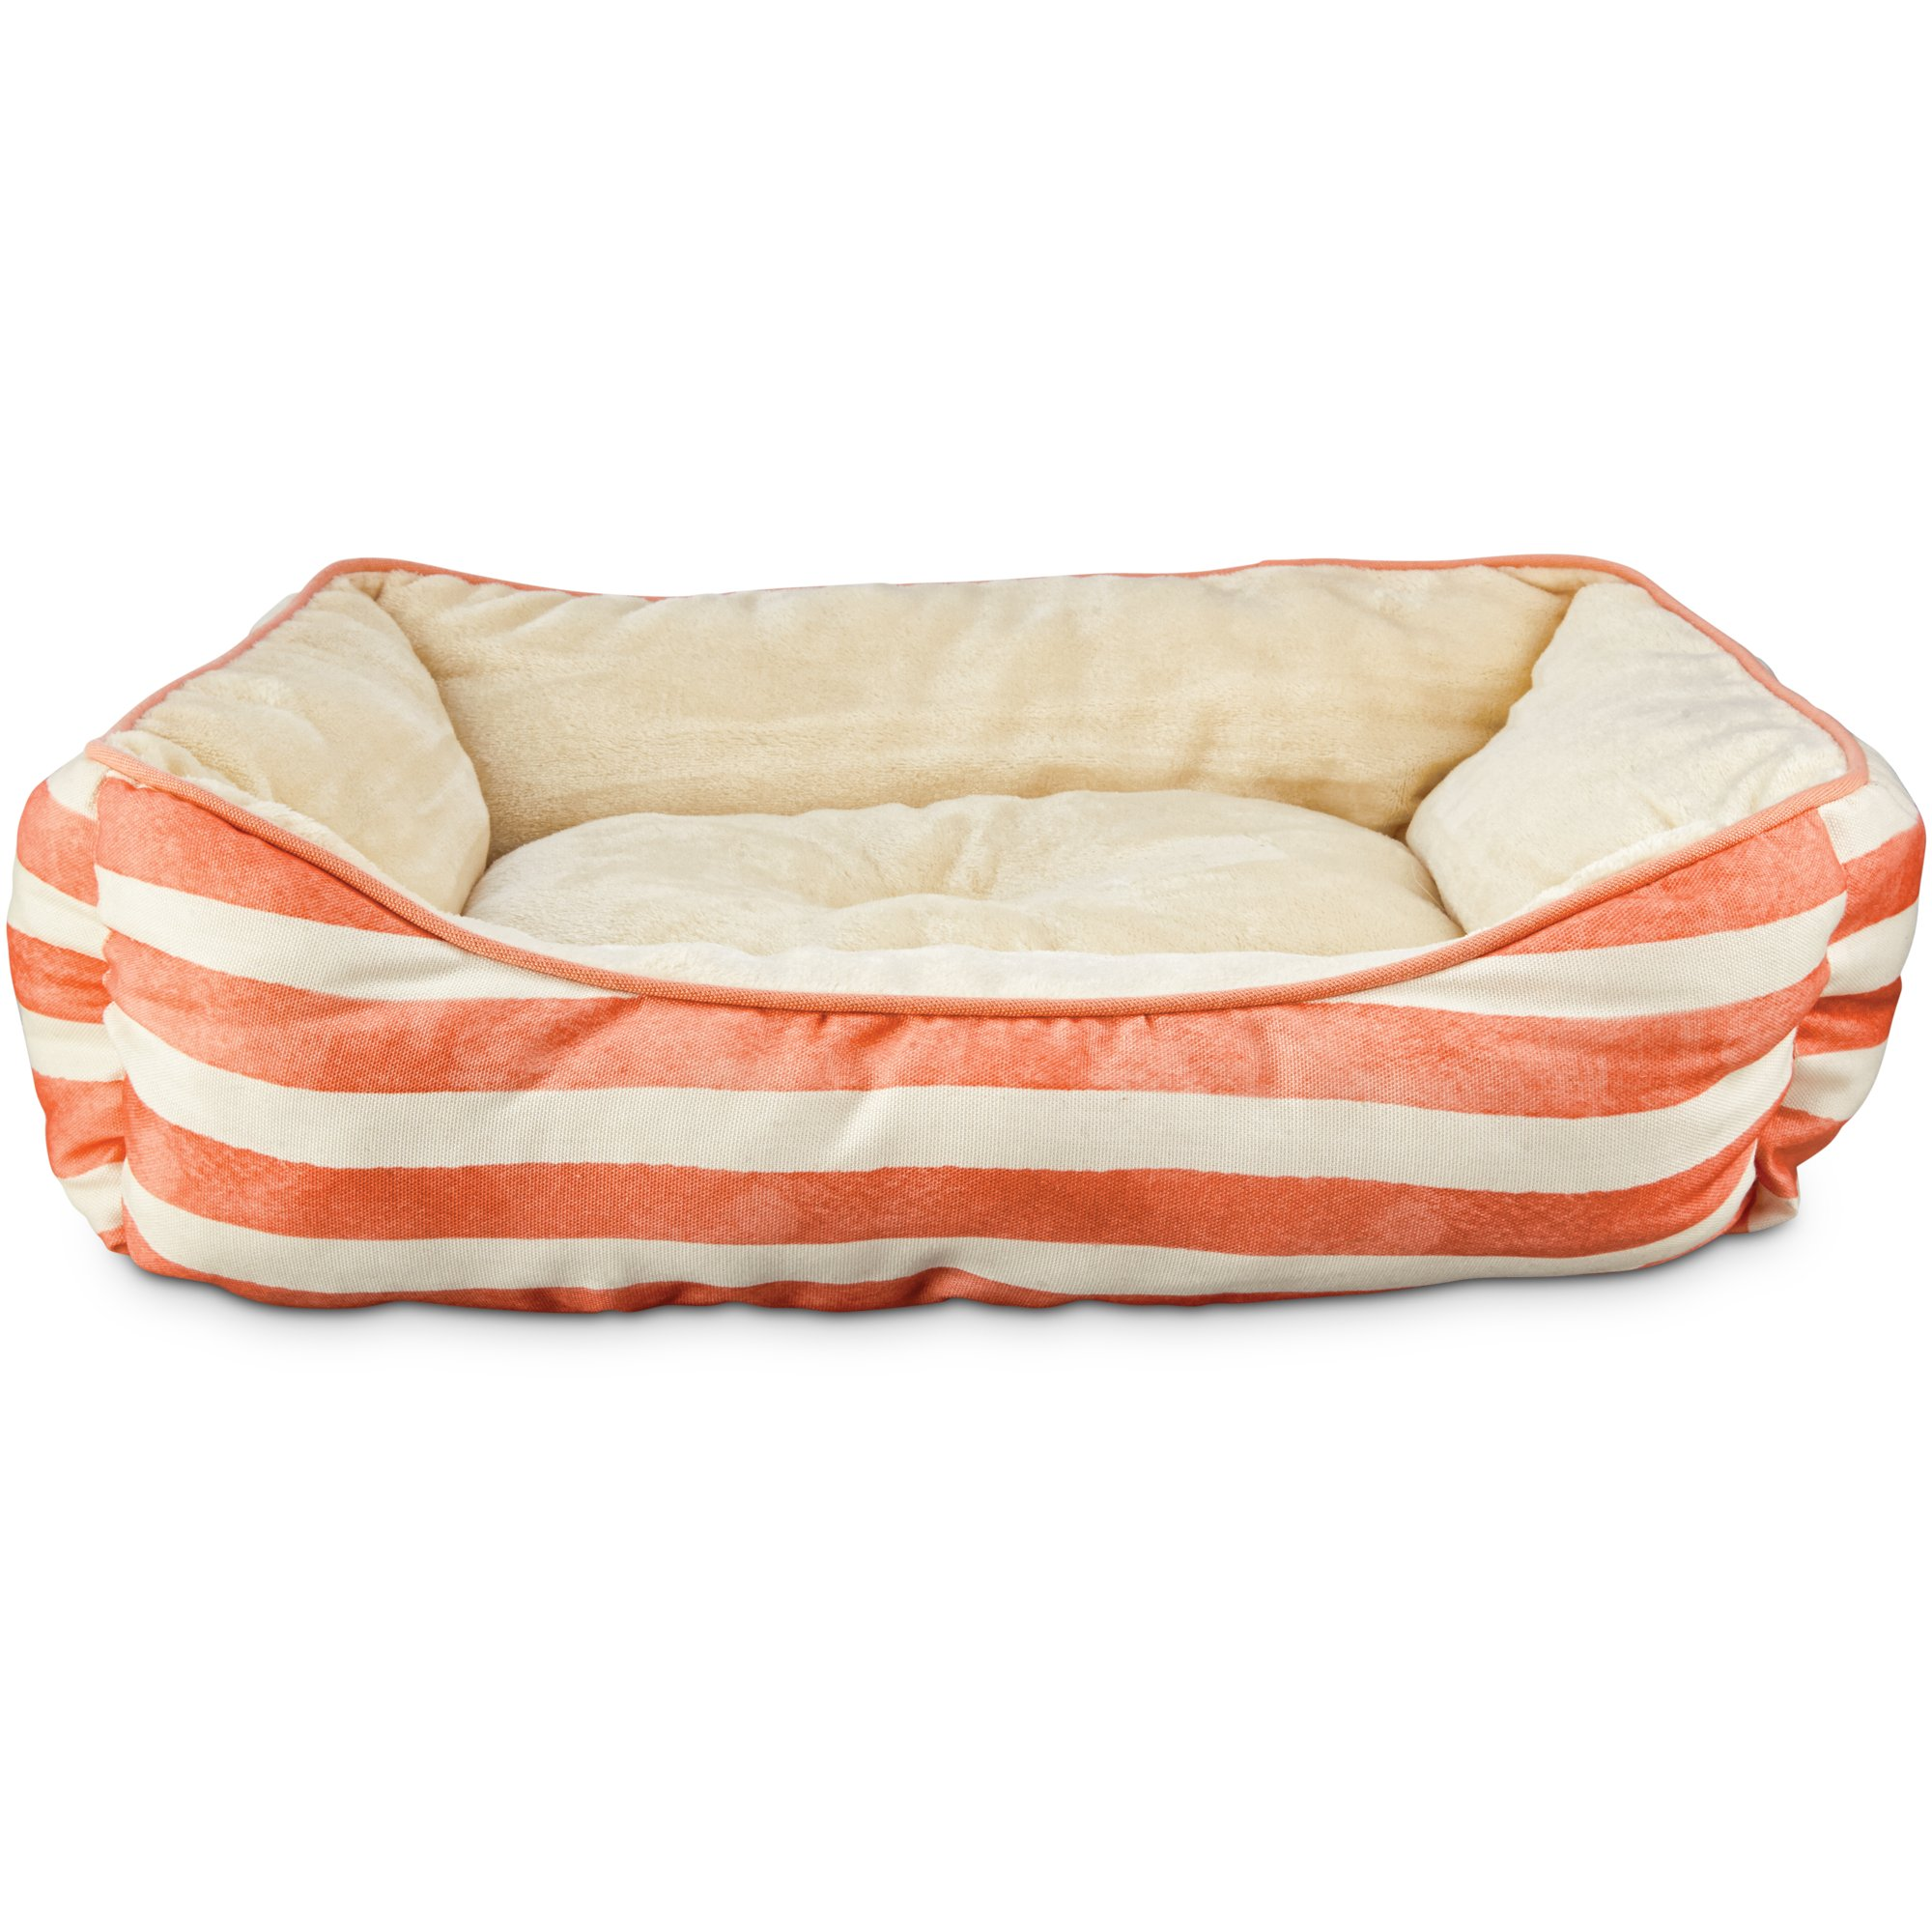 seaside summer coral stripe bolster dog bed | petco